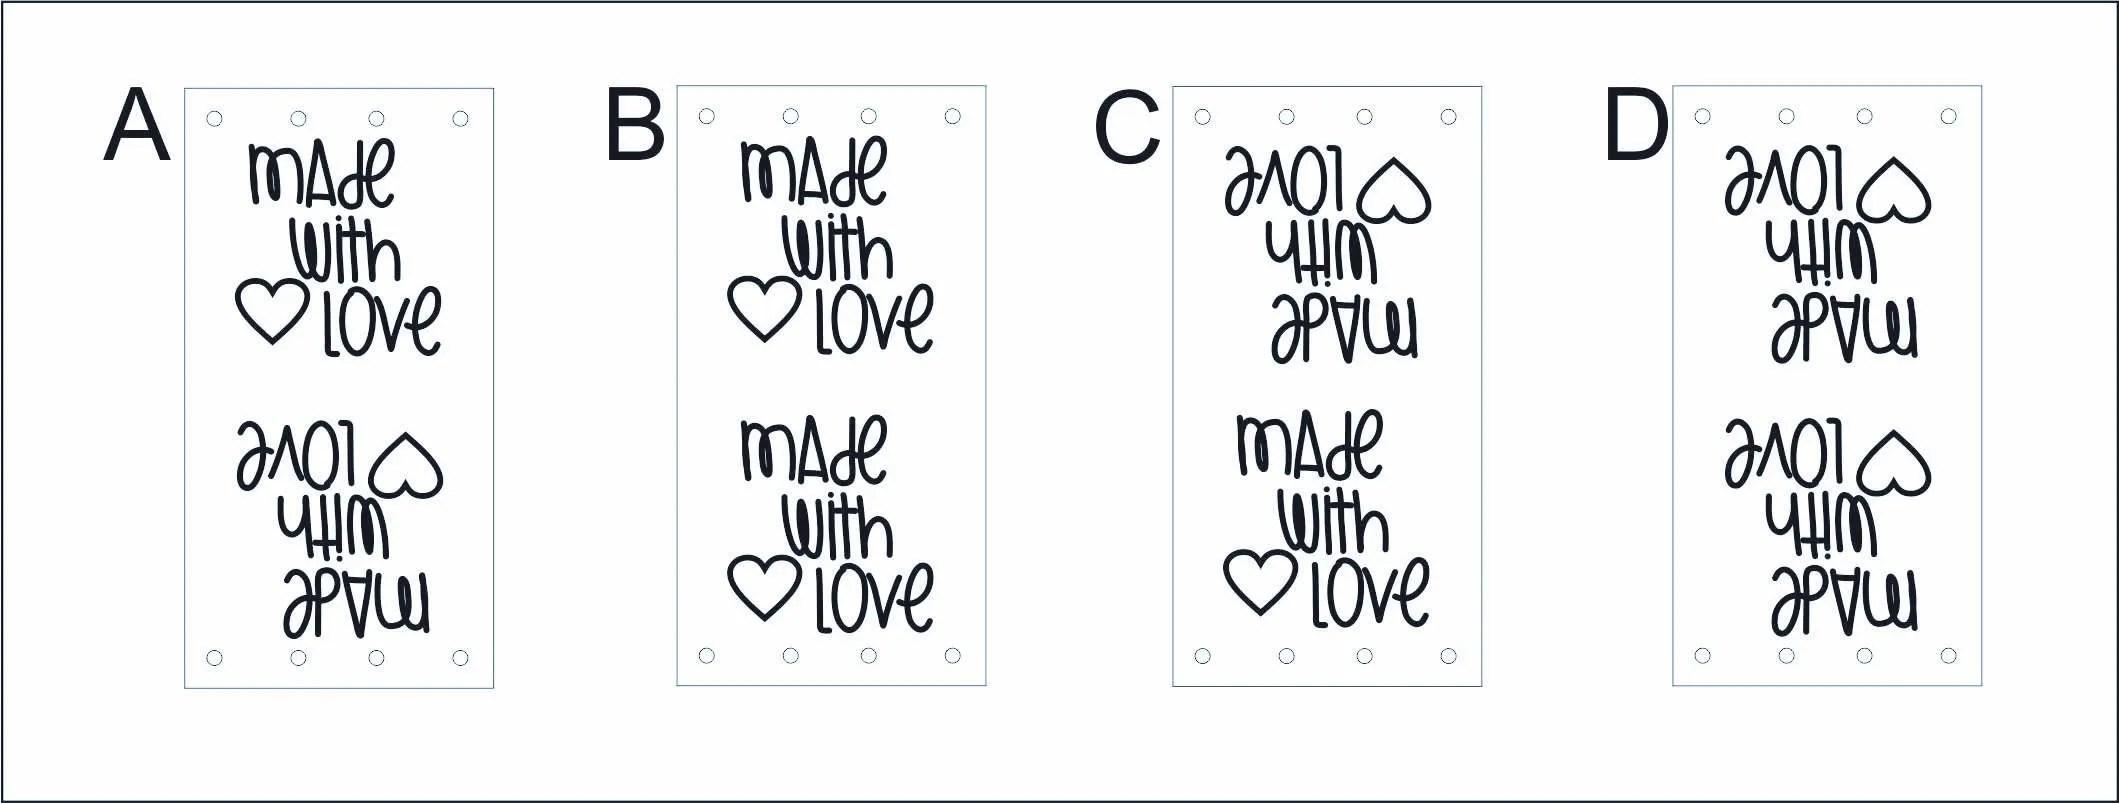 Custom tag ultra suede tag fabric custom tag personalized image 3